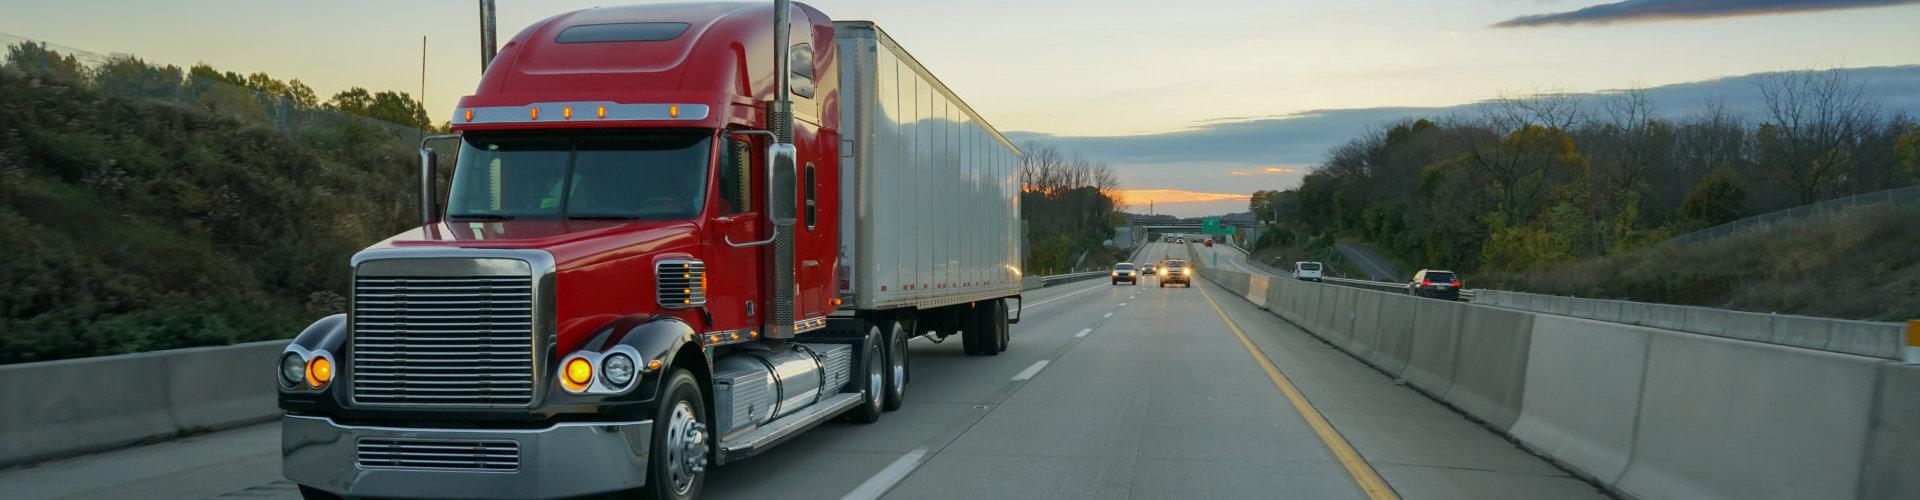 Big red semi truck on highway